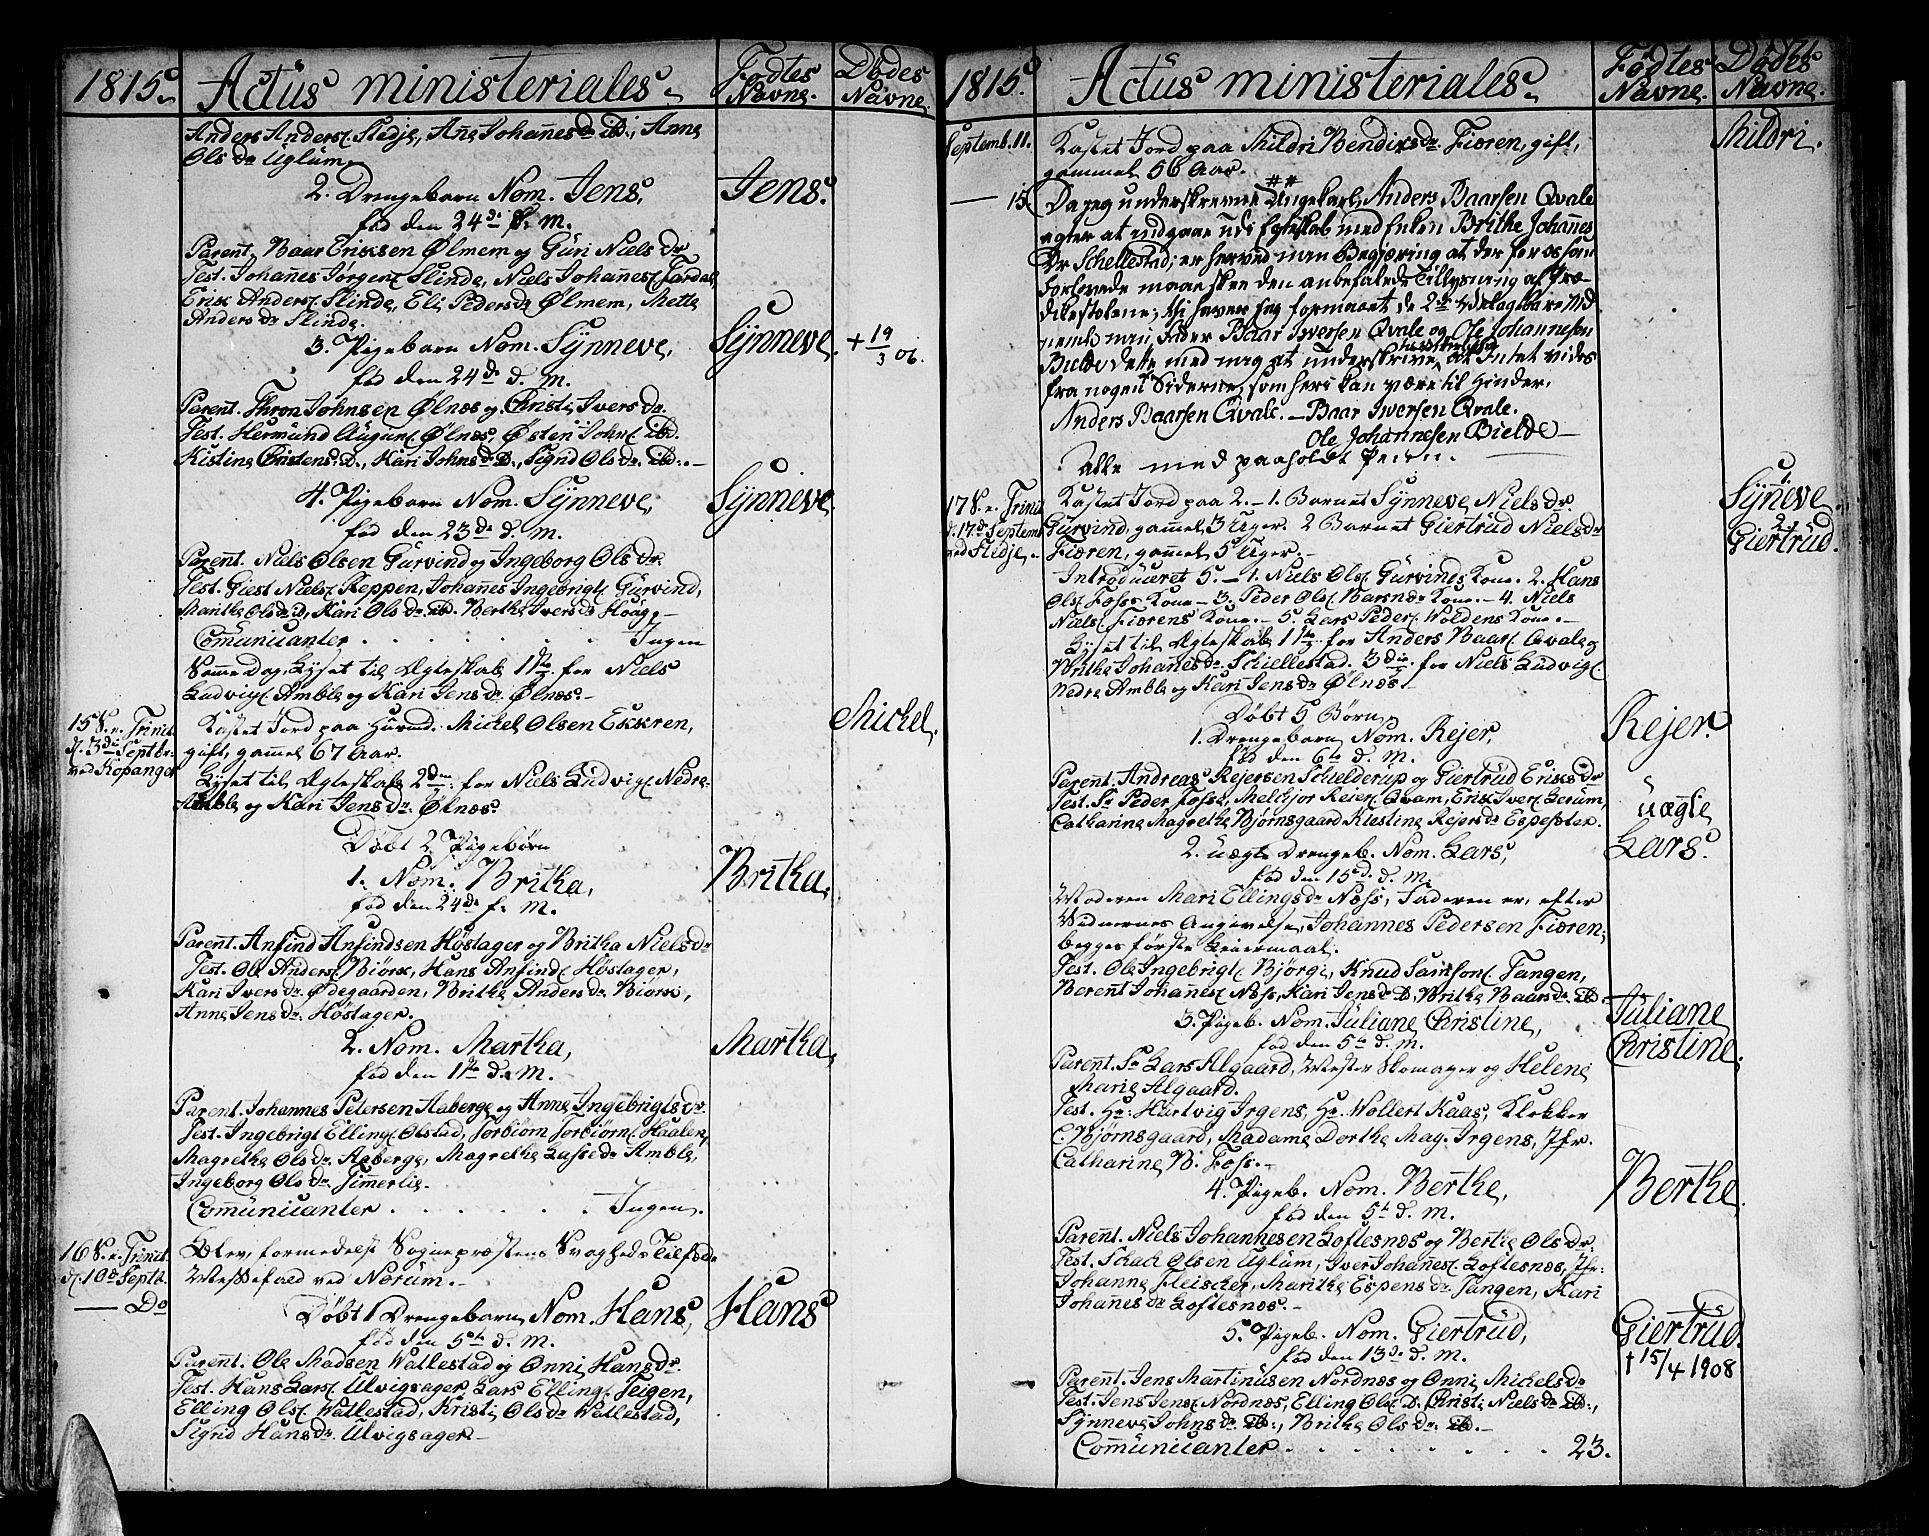 SAB, Sogndal sokneprestembete, H/Haa/Haaa/L0009: Parish register (official) no. A 9, 1809-1821, p. 71